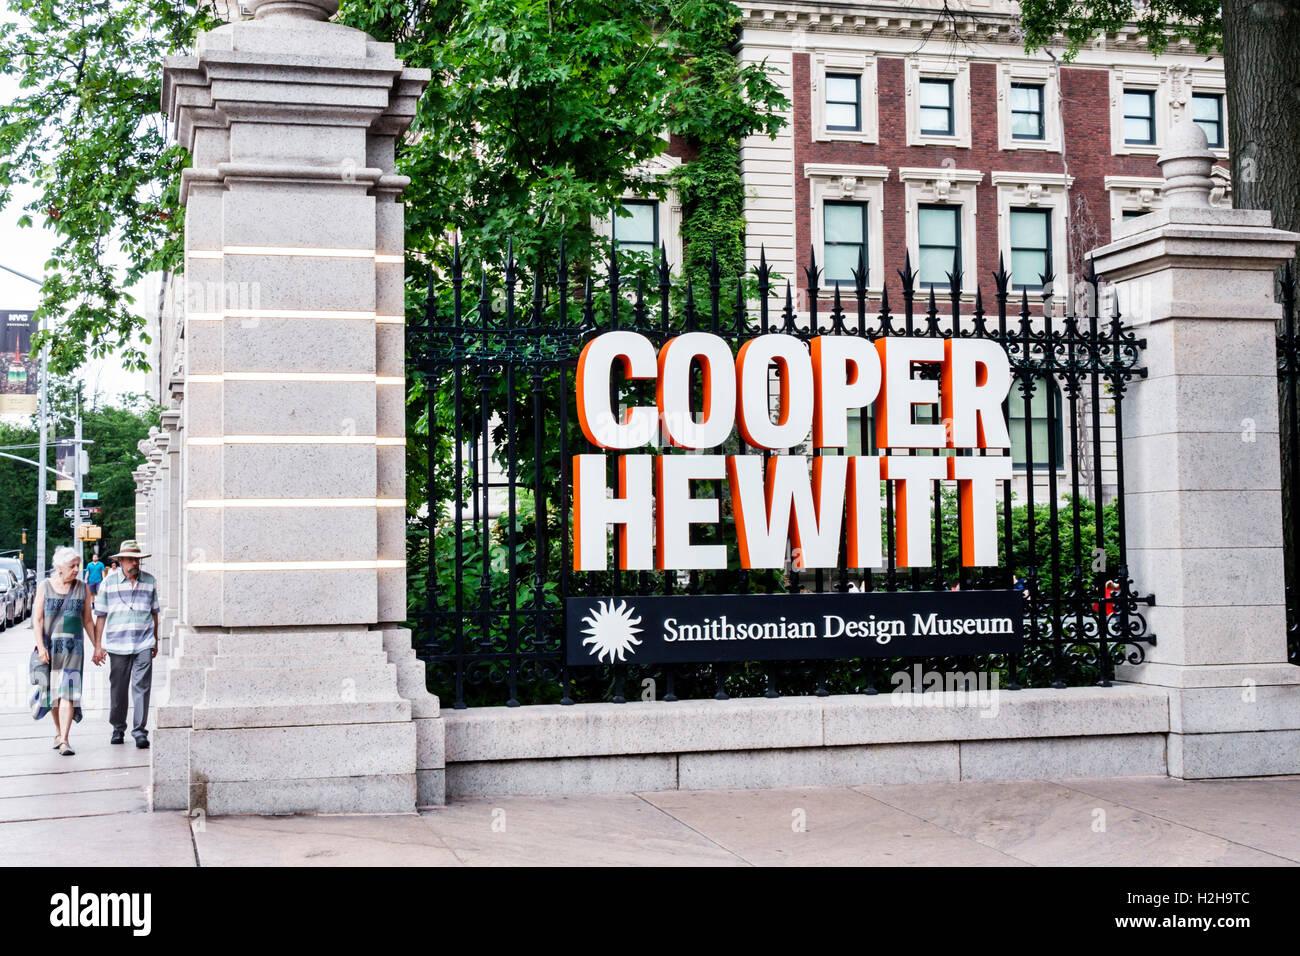 Manhattan New York City NYC NY Upper East Side Cooper Hewitt Design Museum exterior sign - Stock Image